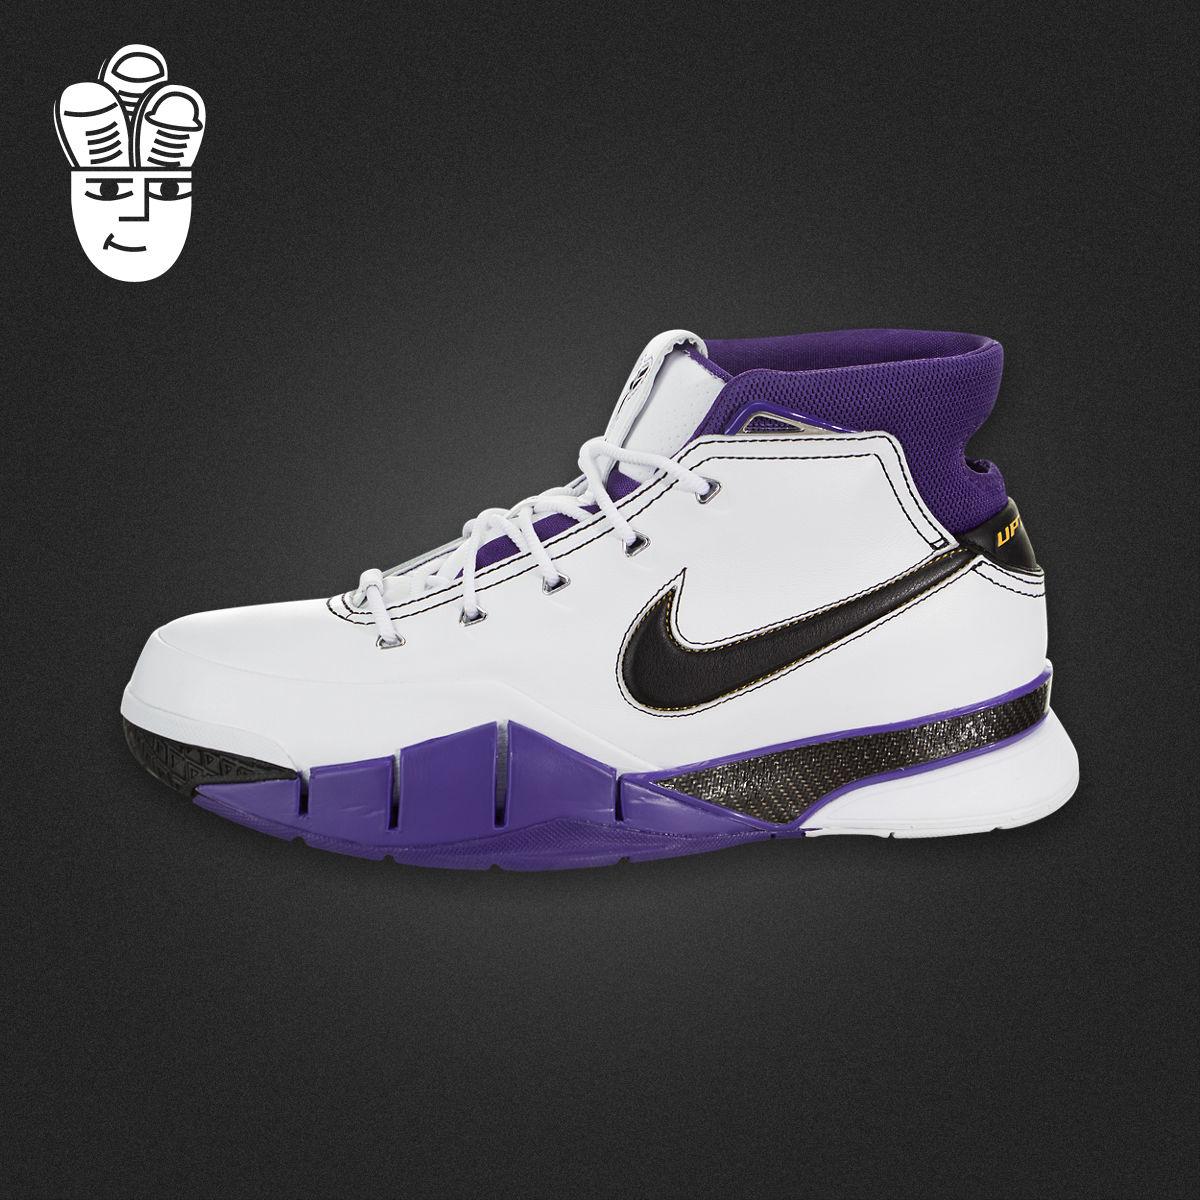 Nike Kobe 1 耐克男子篮球鞋 科比1代签名战靴 81分 aq2728-105